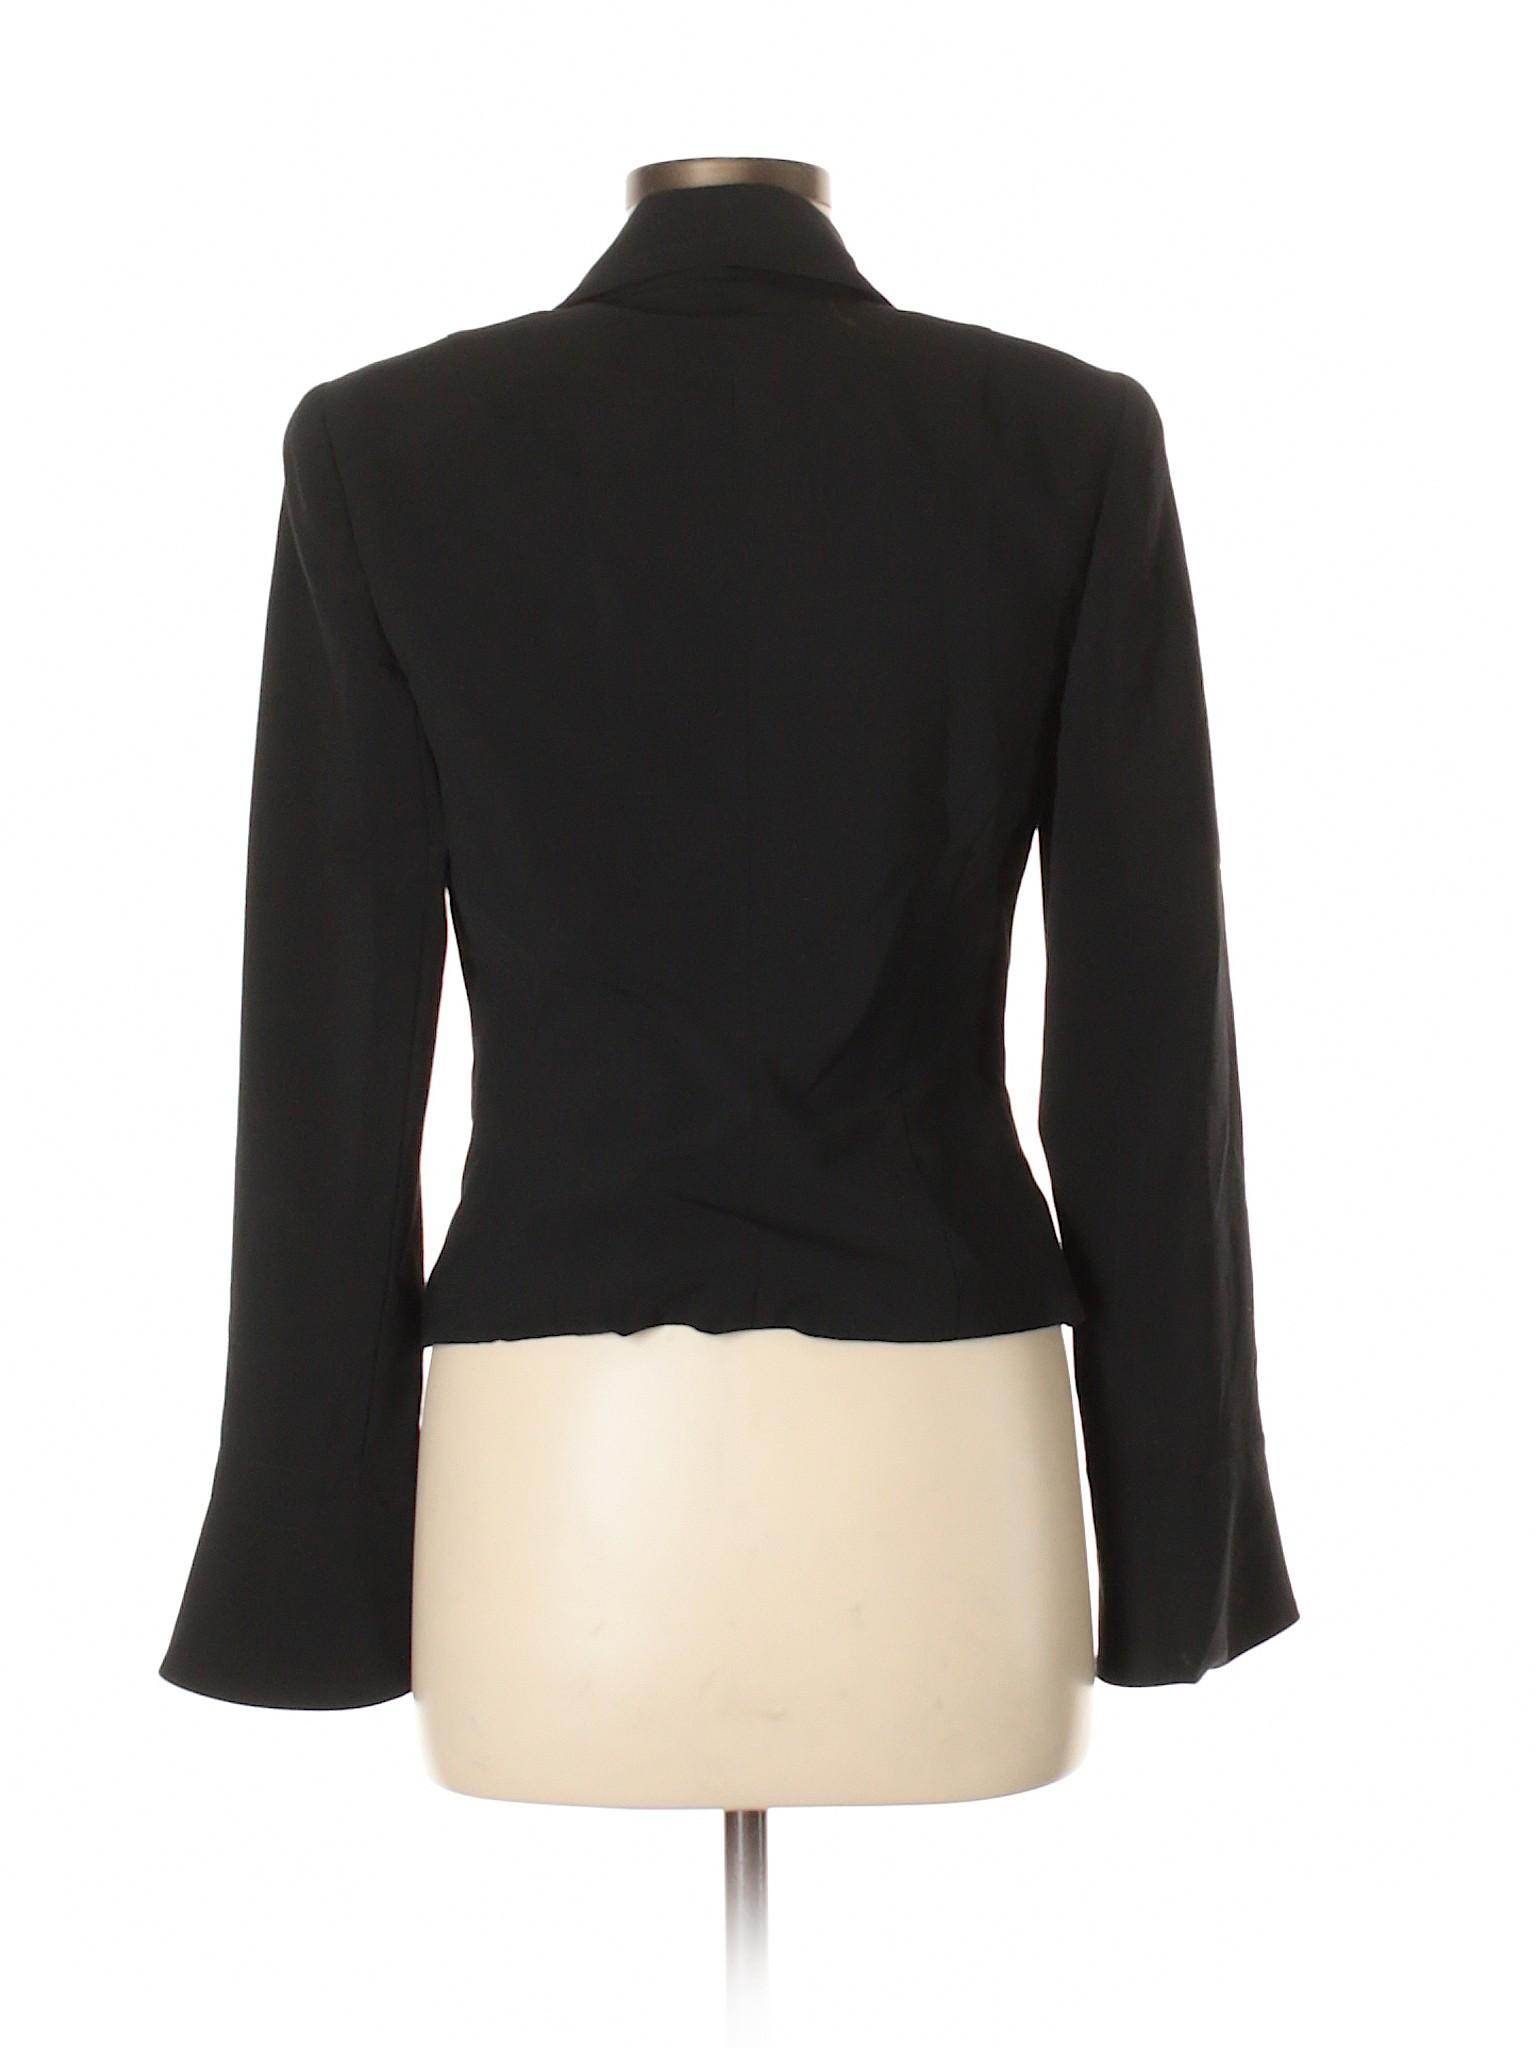 Boutique winter Boutique winter Blazer Turk Trina qdp5xxZn0